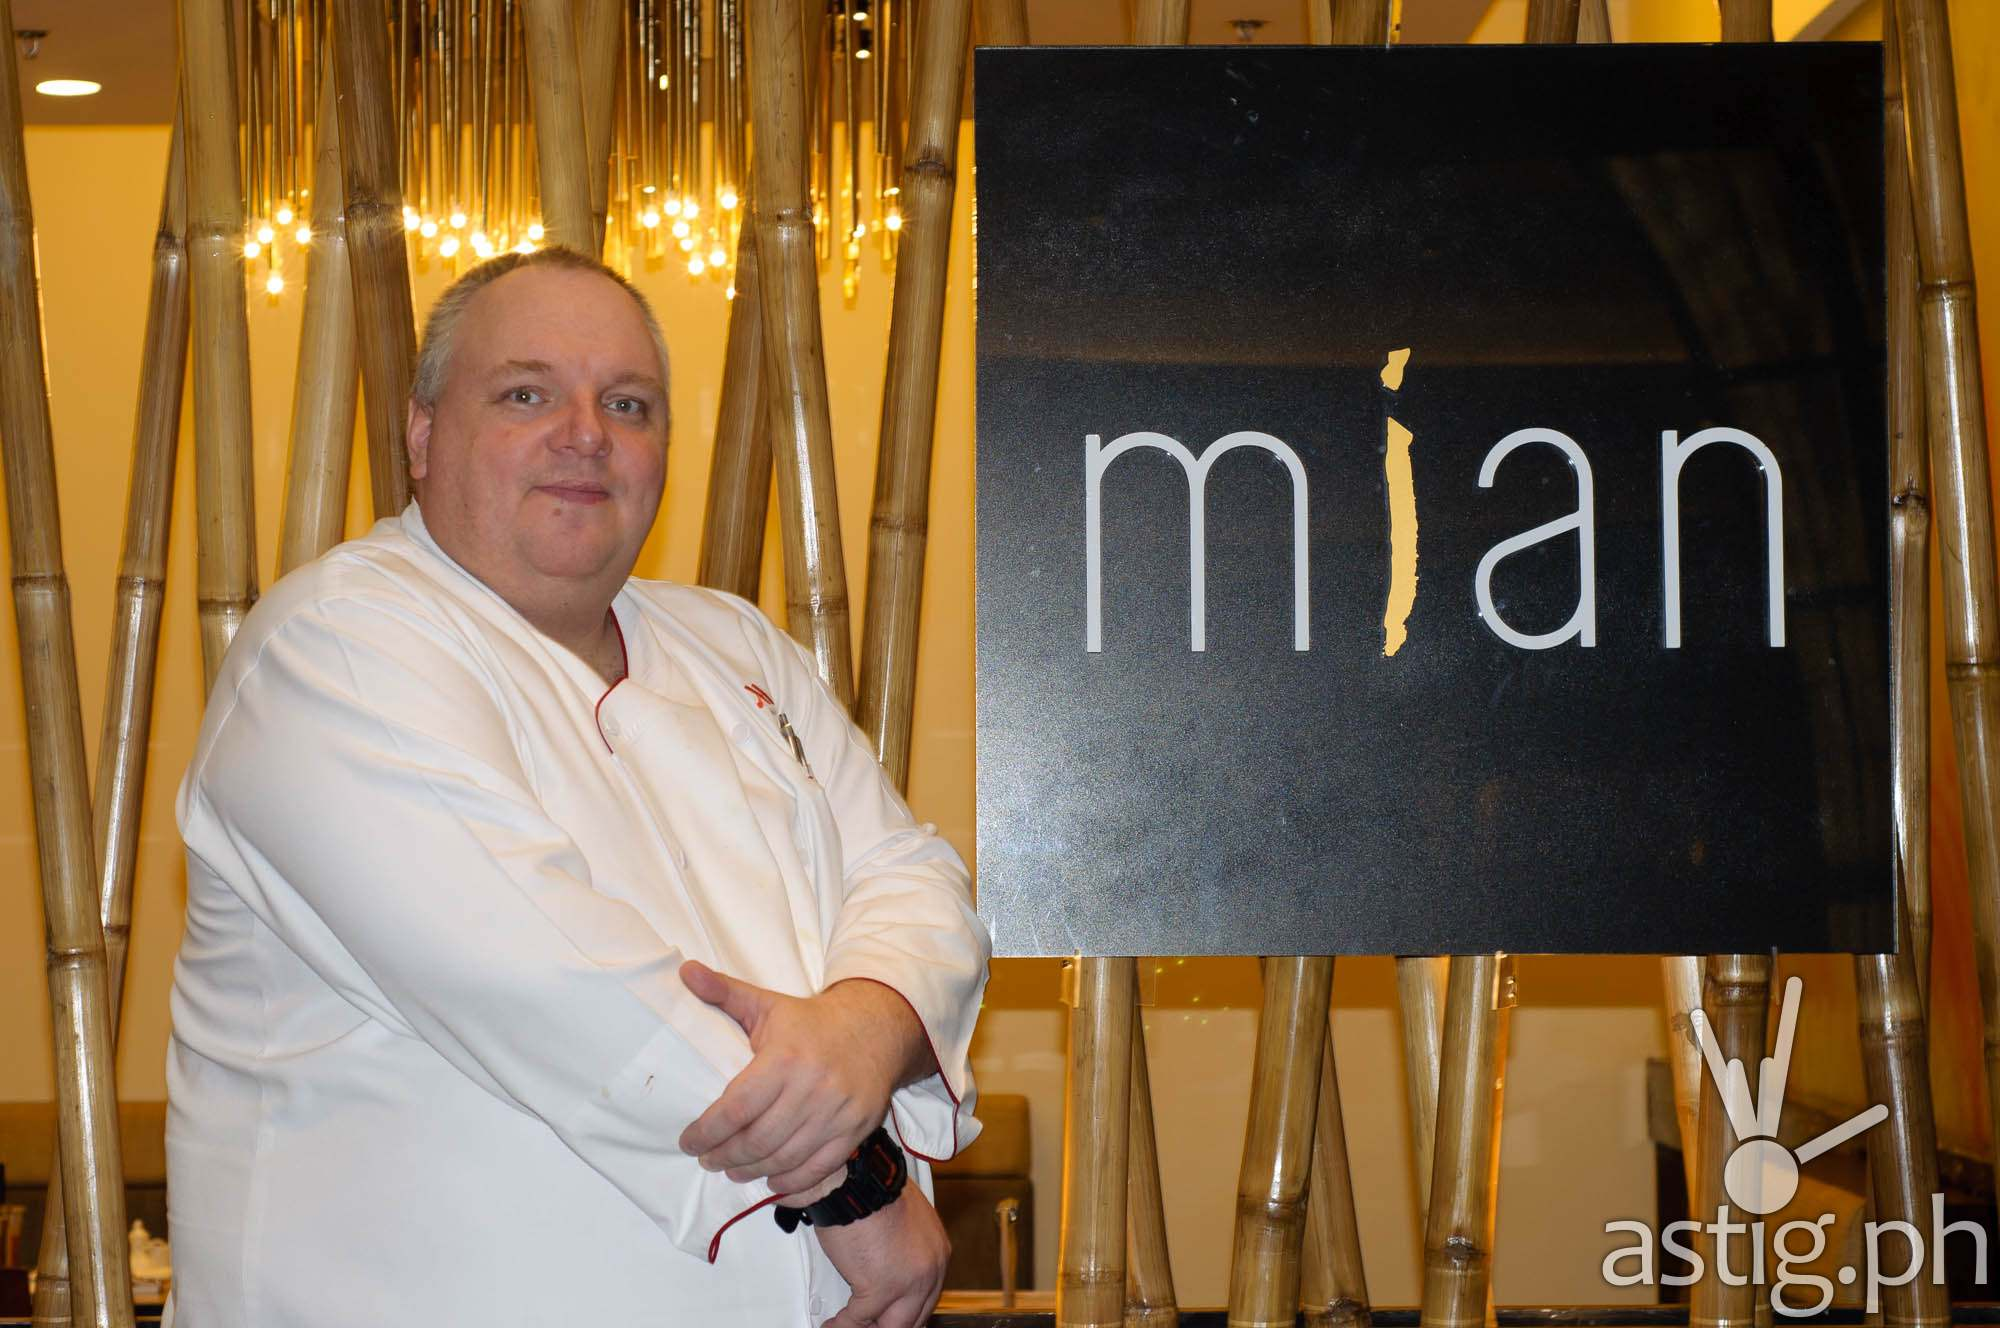 Meik Brammer, Executive Chef, Marriott Manila at Mian